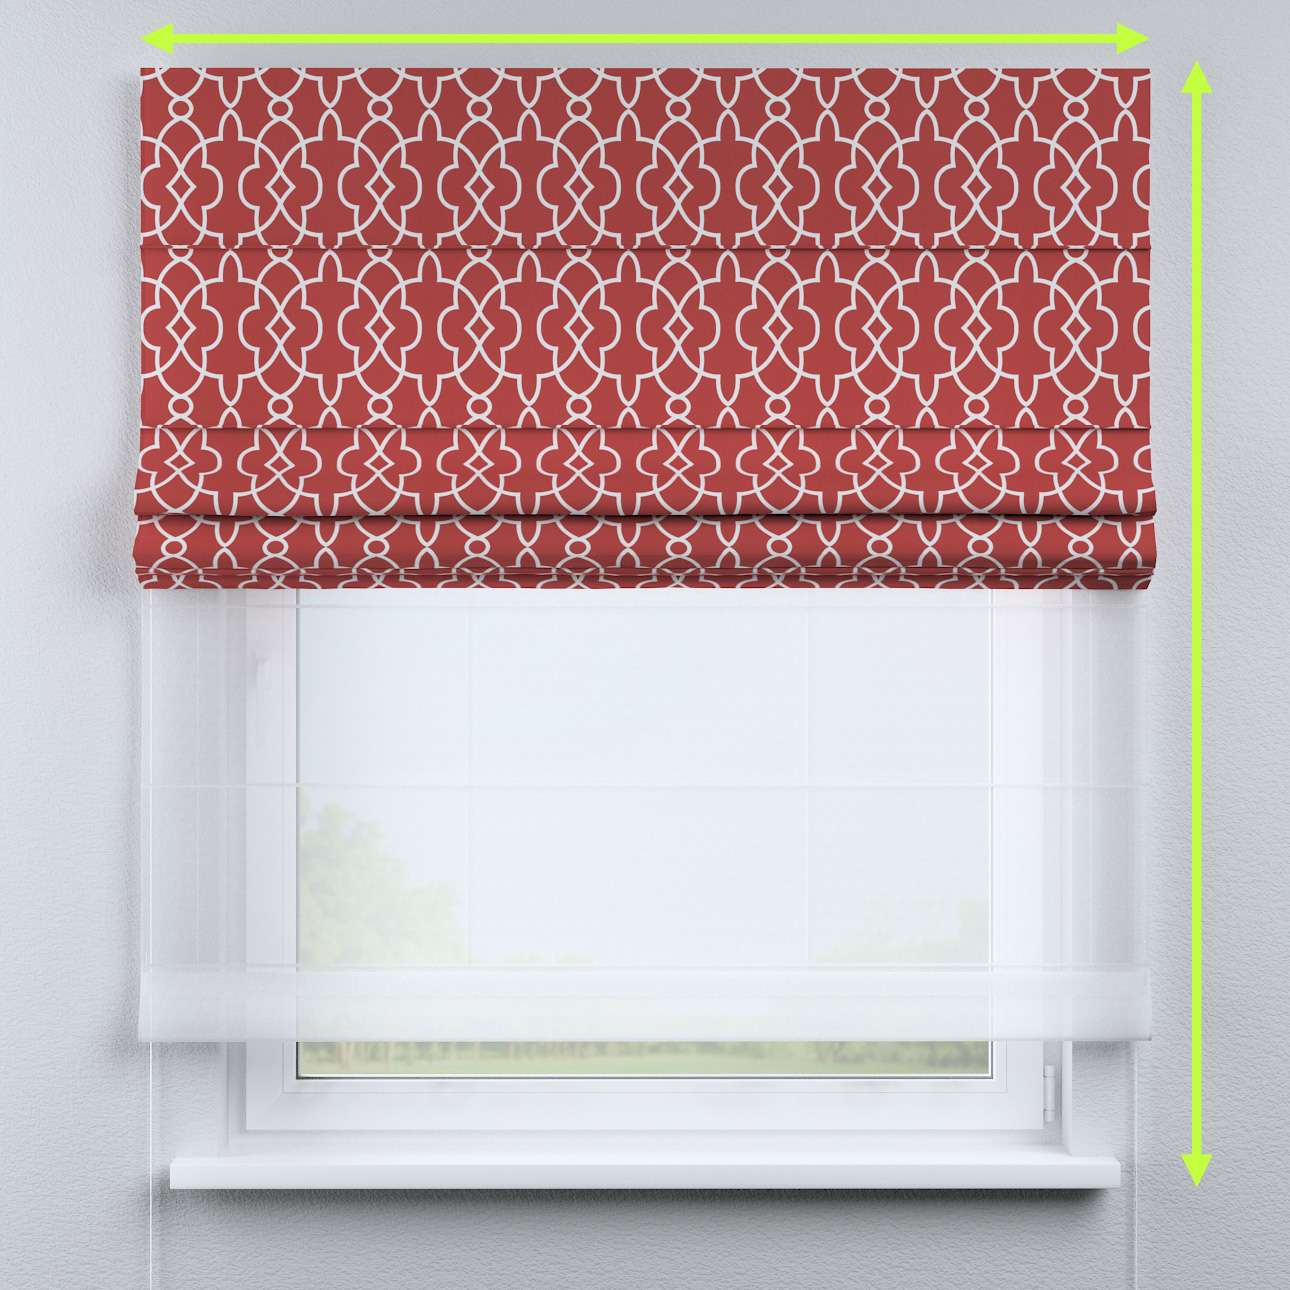 DUO Rímska roleta V kolekcii Gardenia, tkanina: 142-21